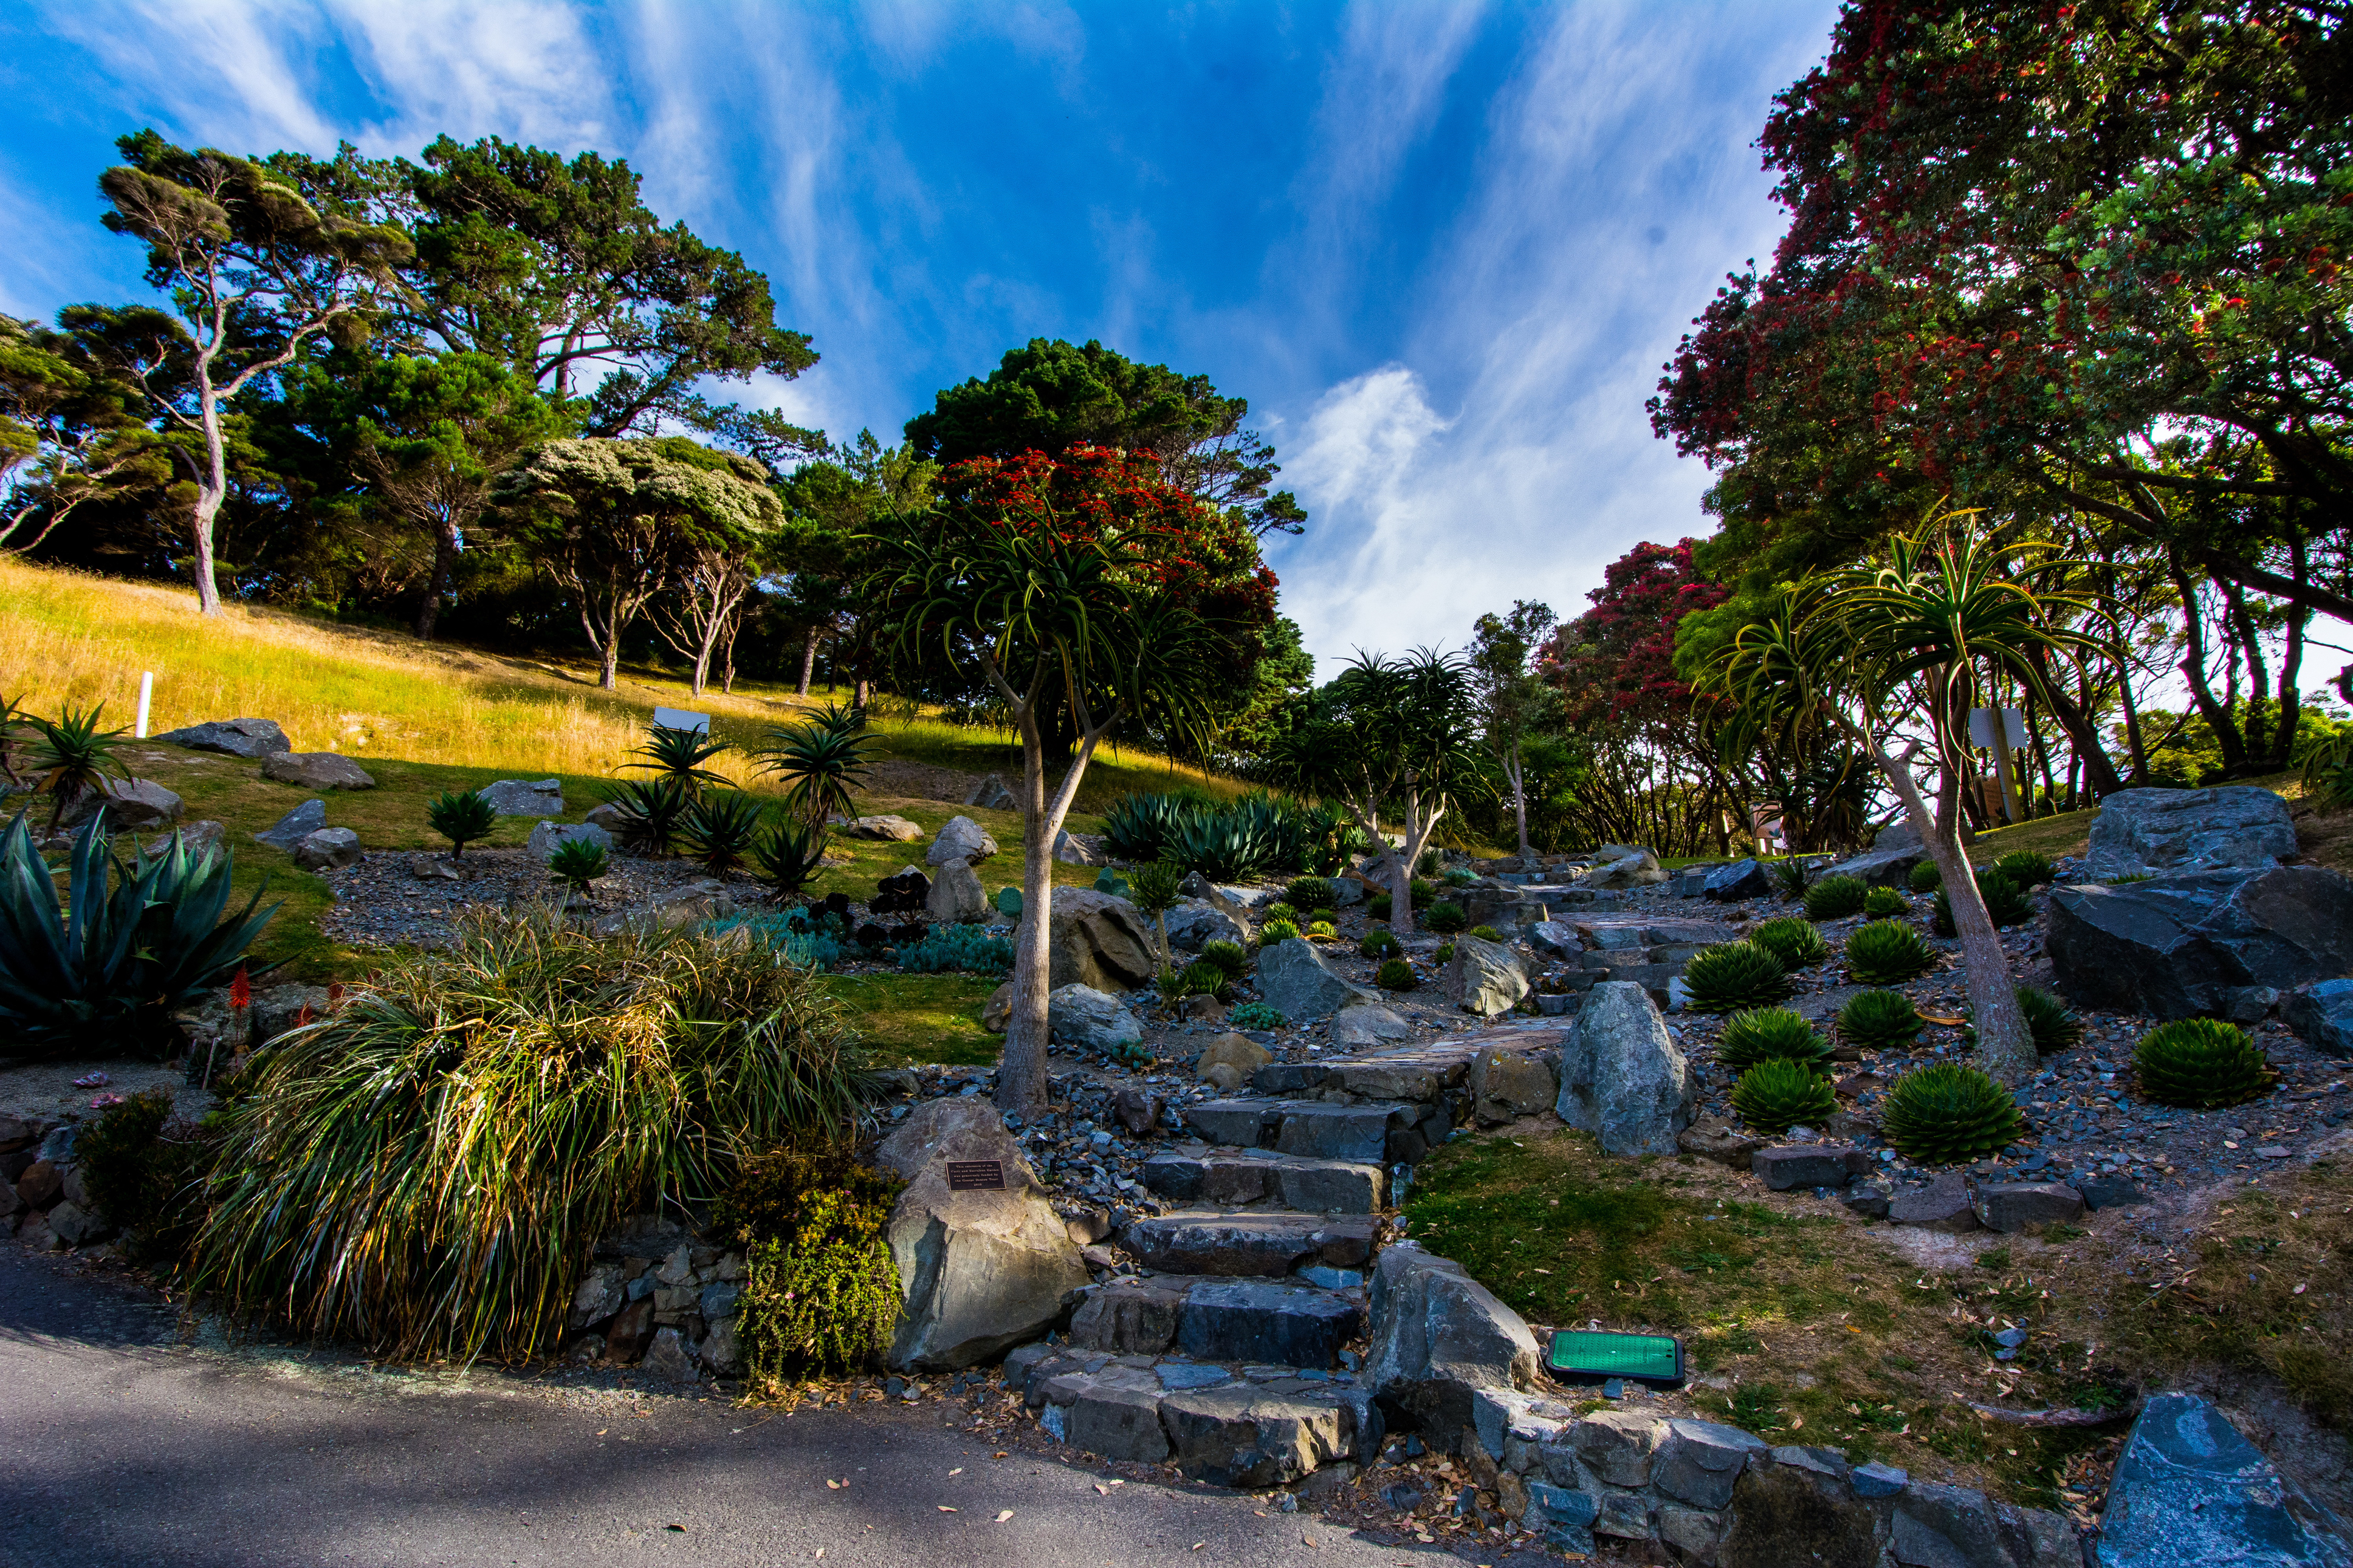 Images New Zealand Wellington Botanical garden Nature 3872x2581 3872x2581